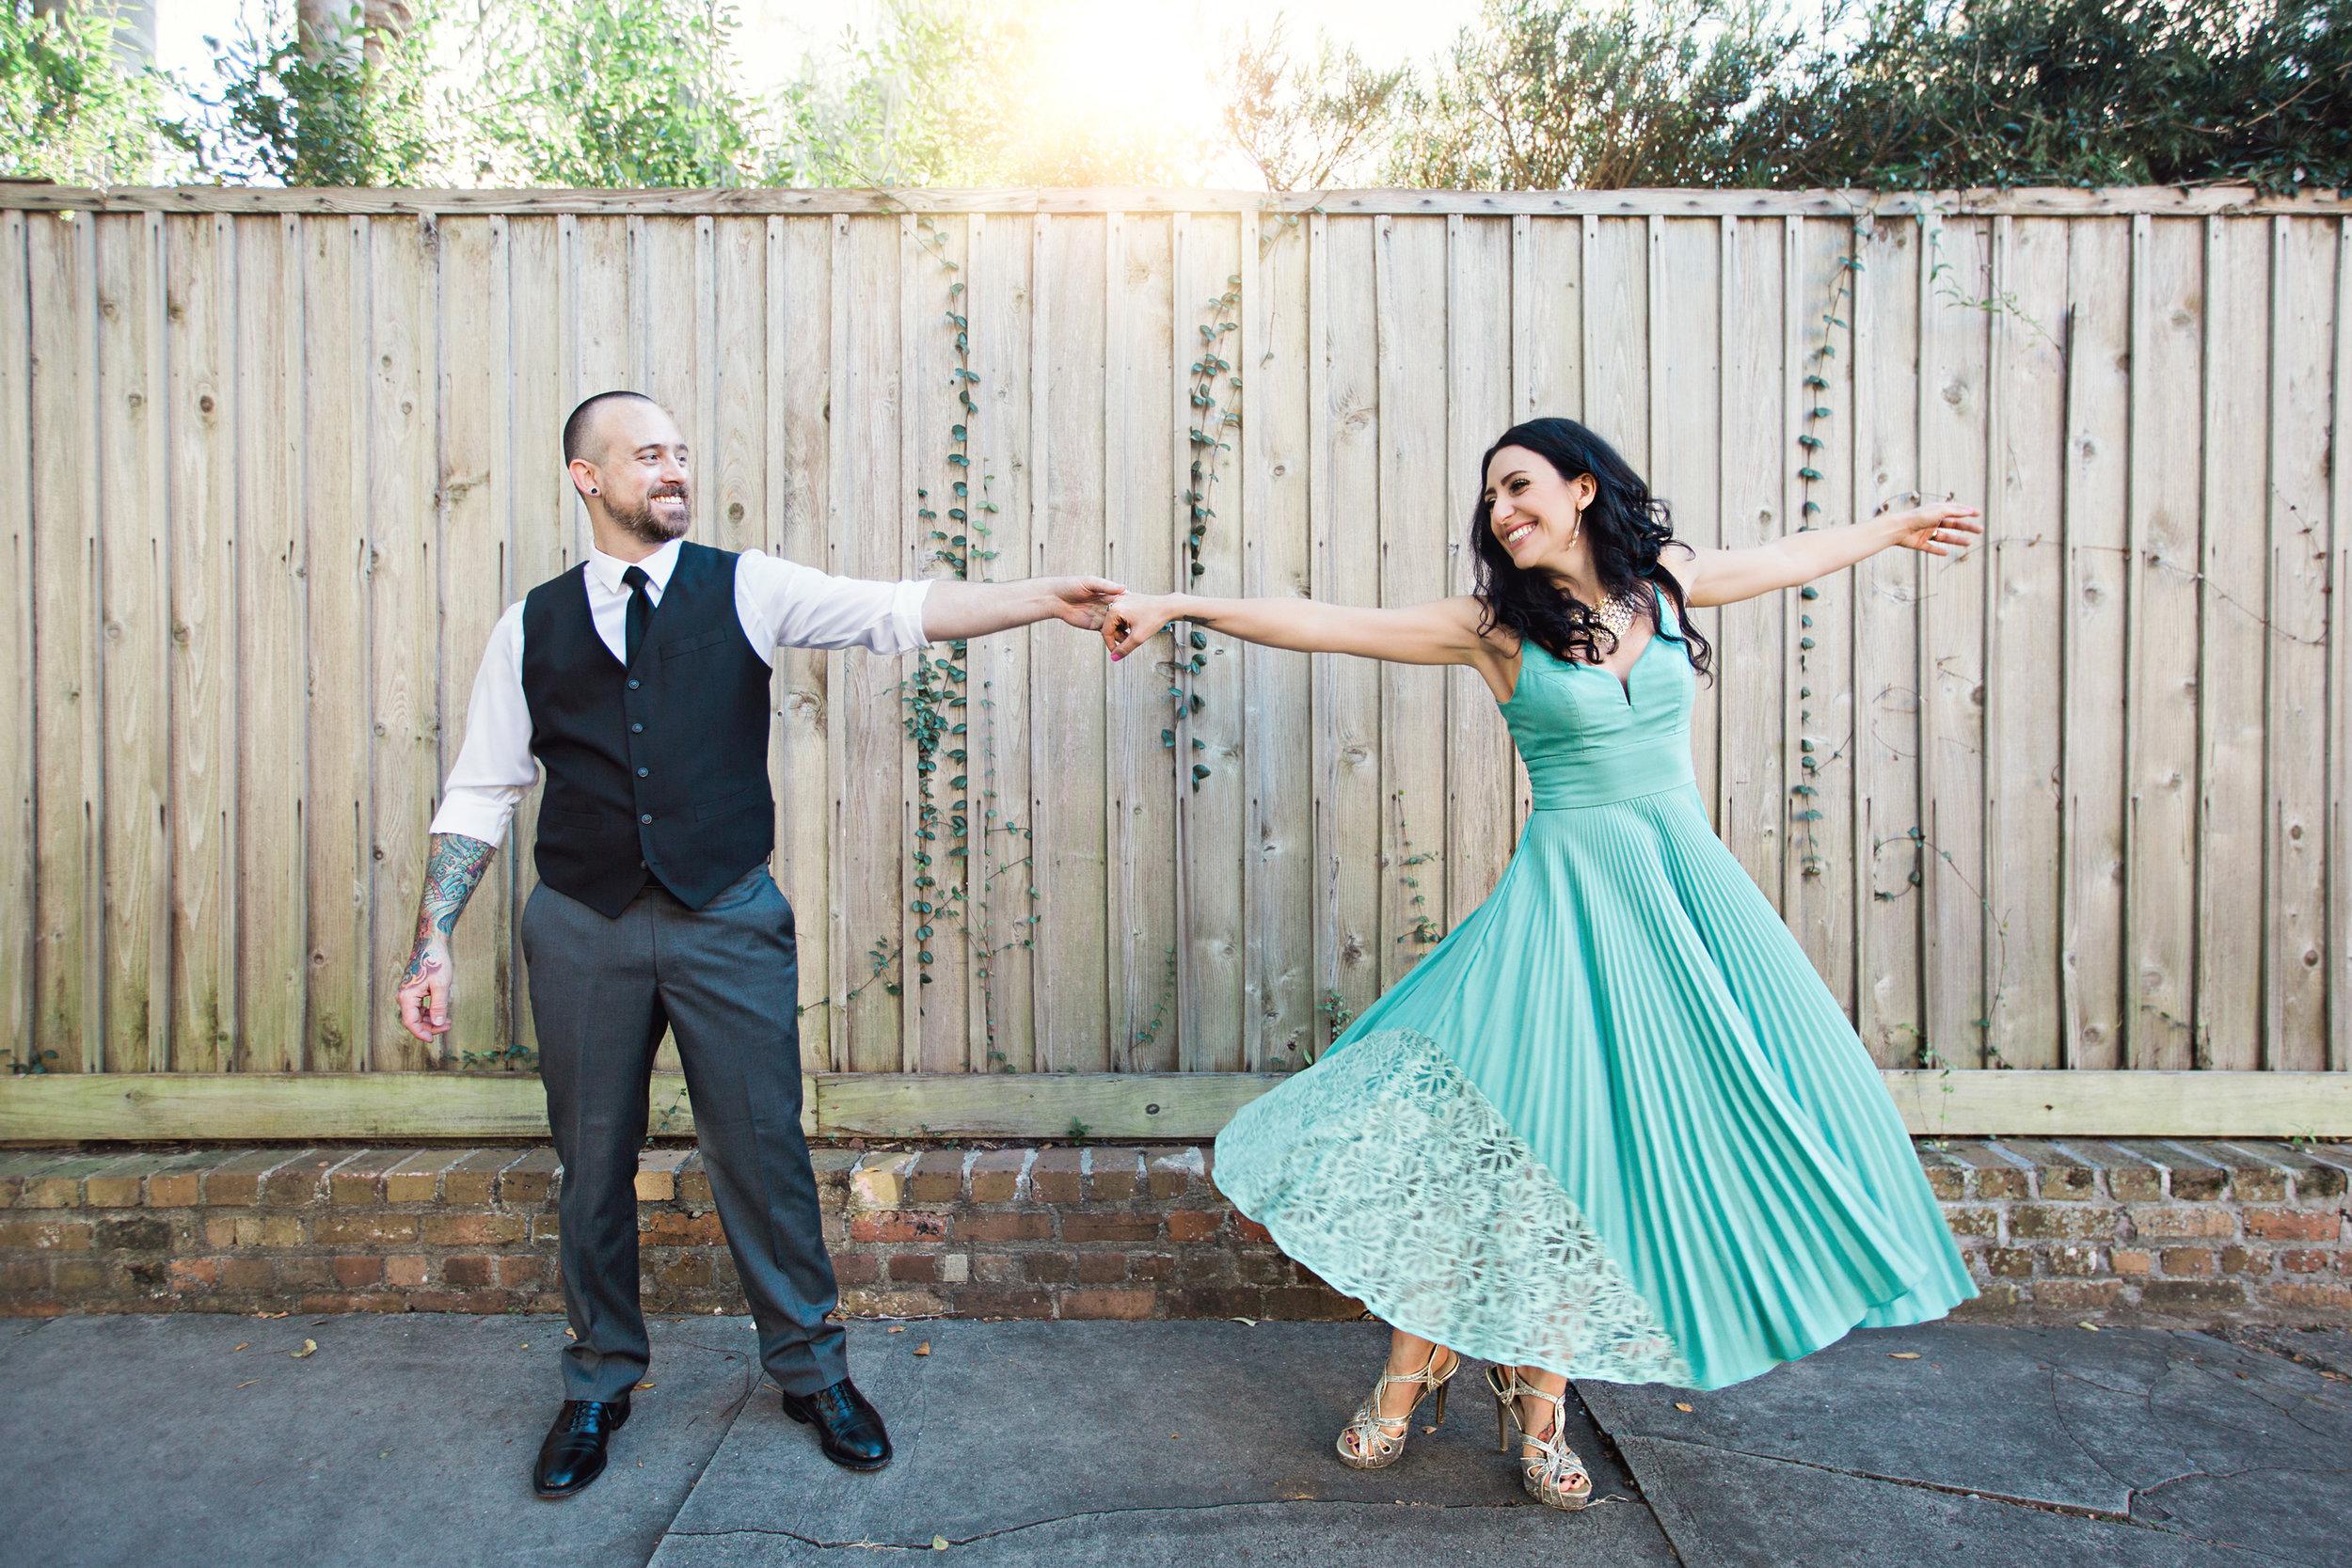 CindyGiovagnoliPhotography_Seattle_Washington_PNW_Couple_Engagement_Portrait_Photography-005.jpg